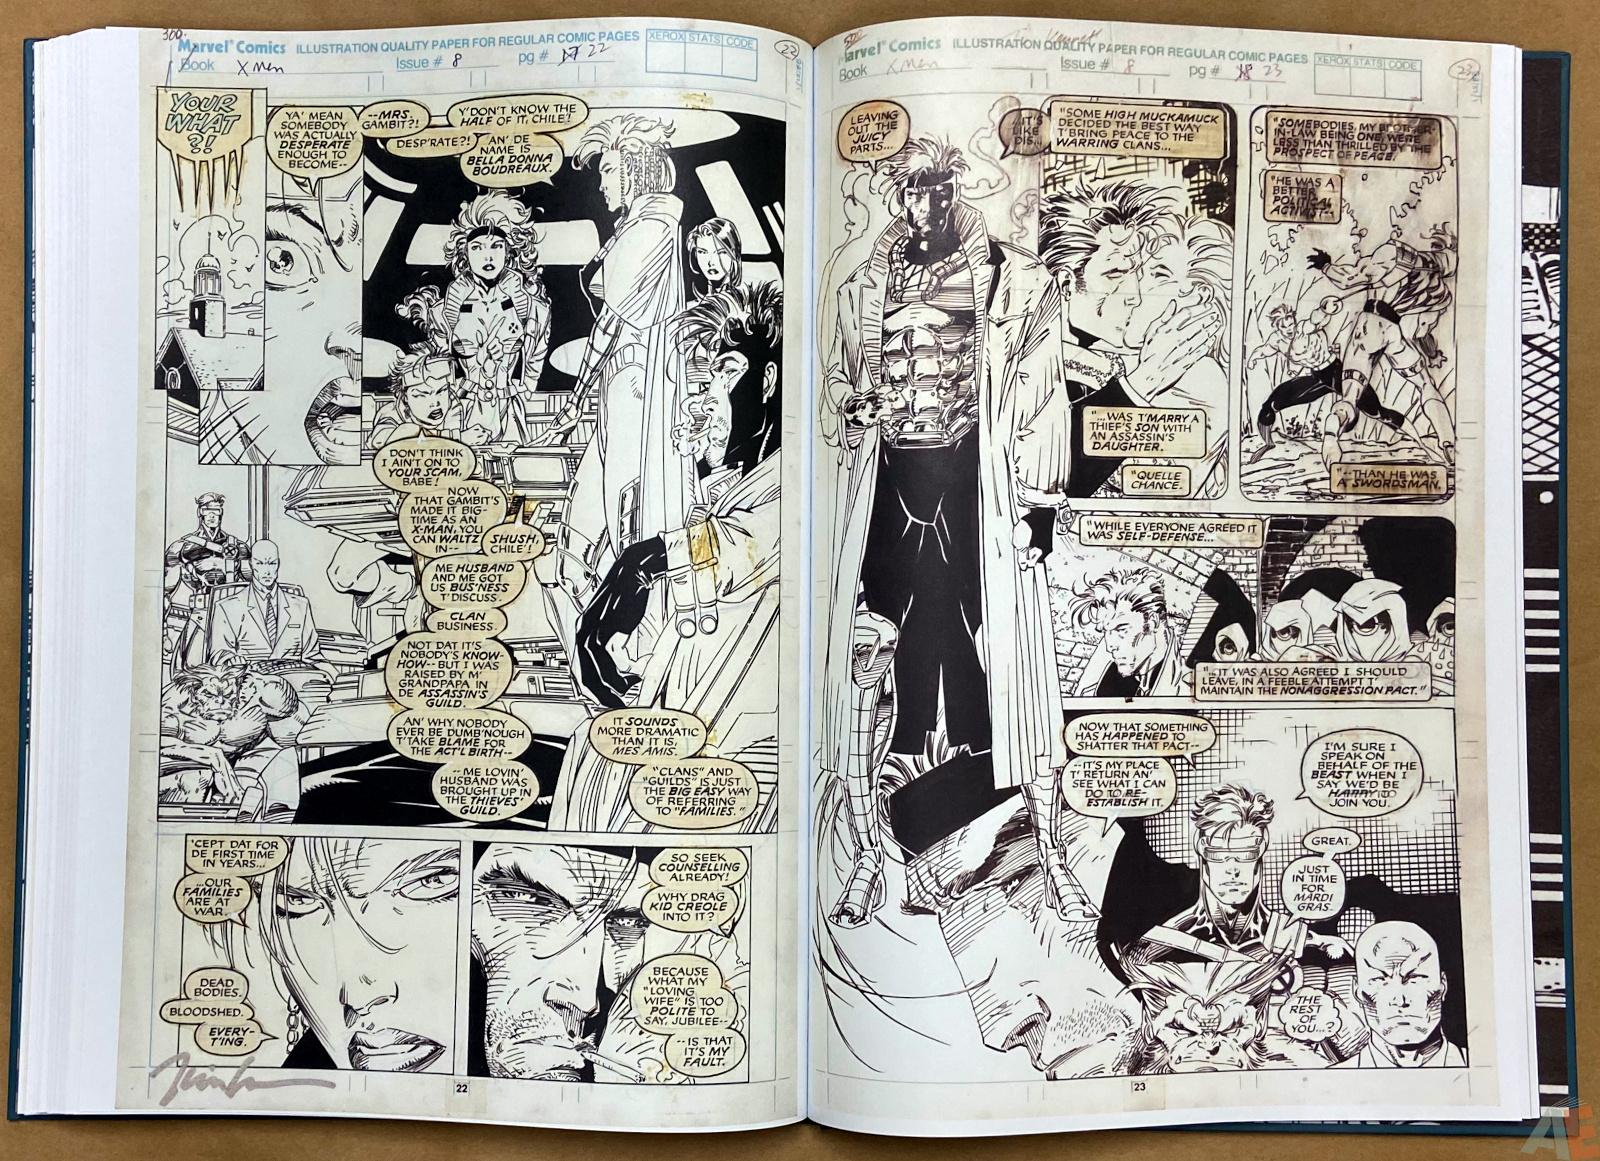 Jim Lees X Men Artists Edition interior 18